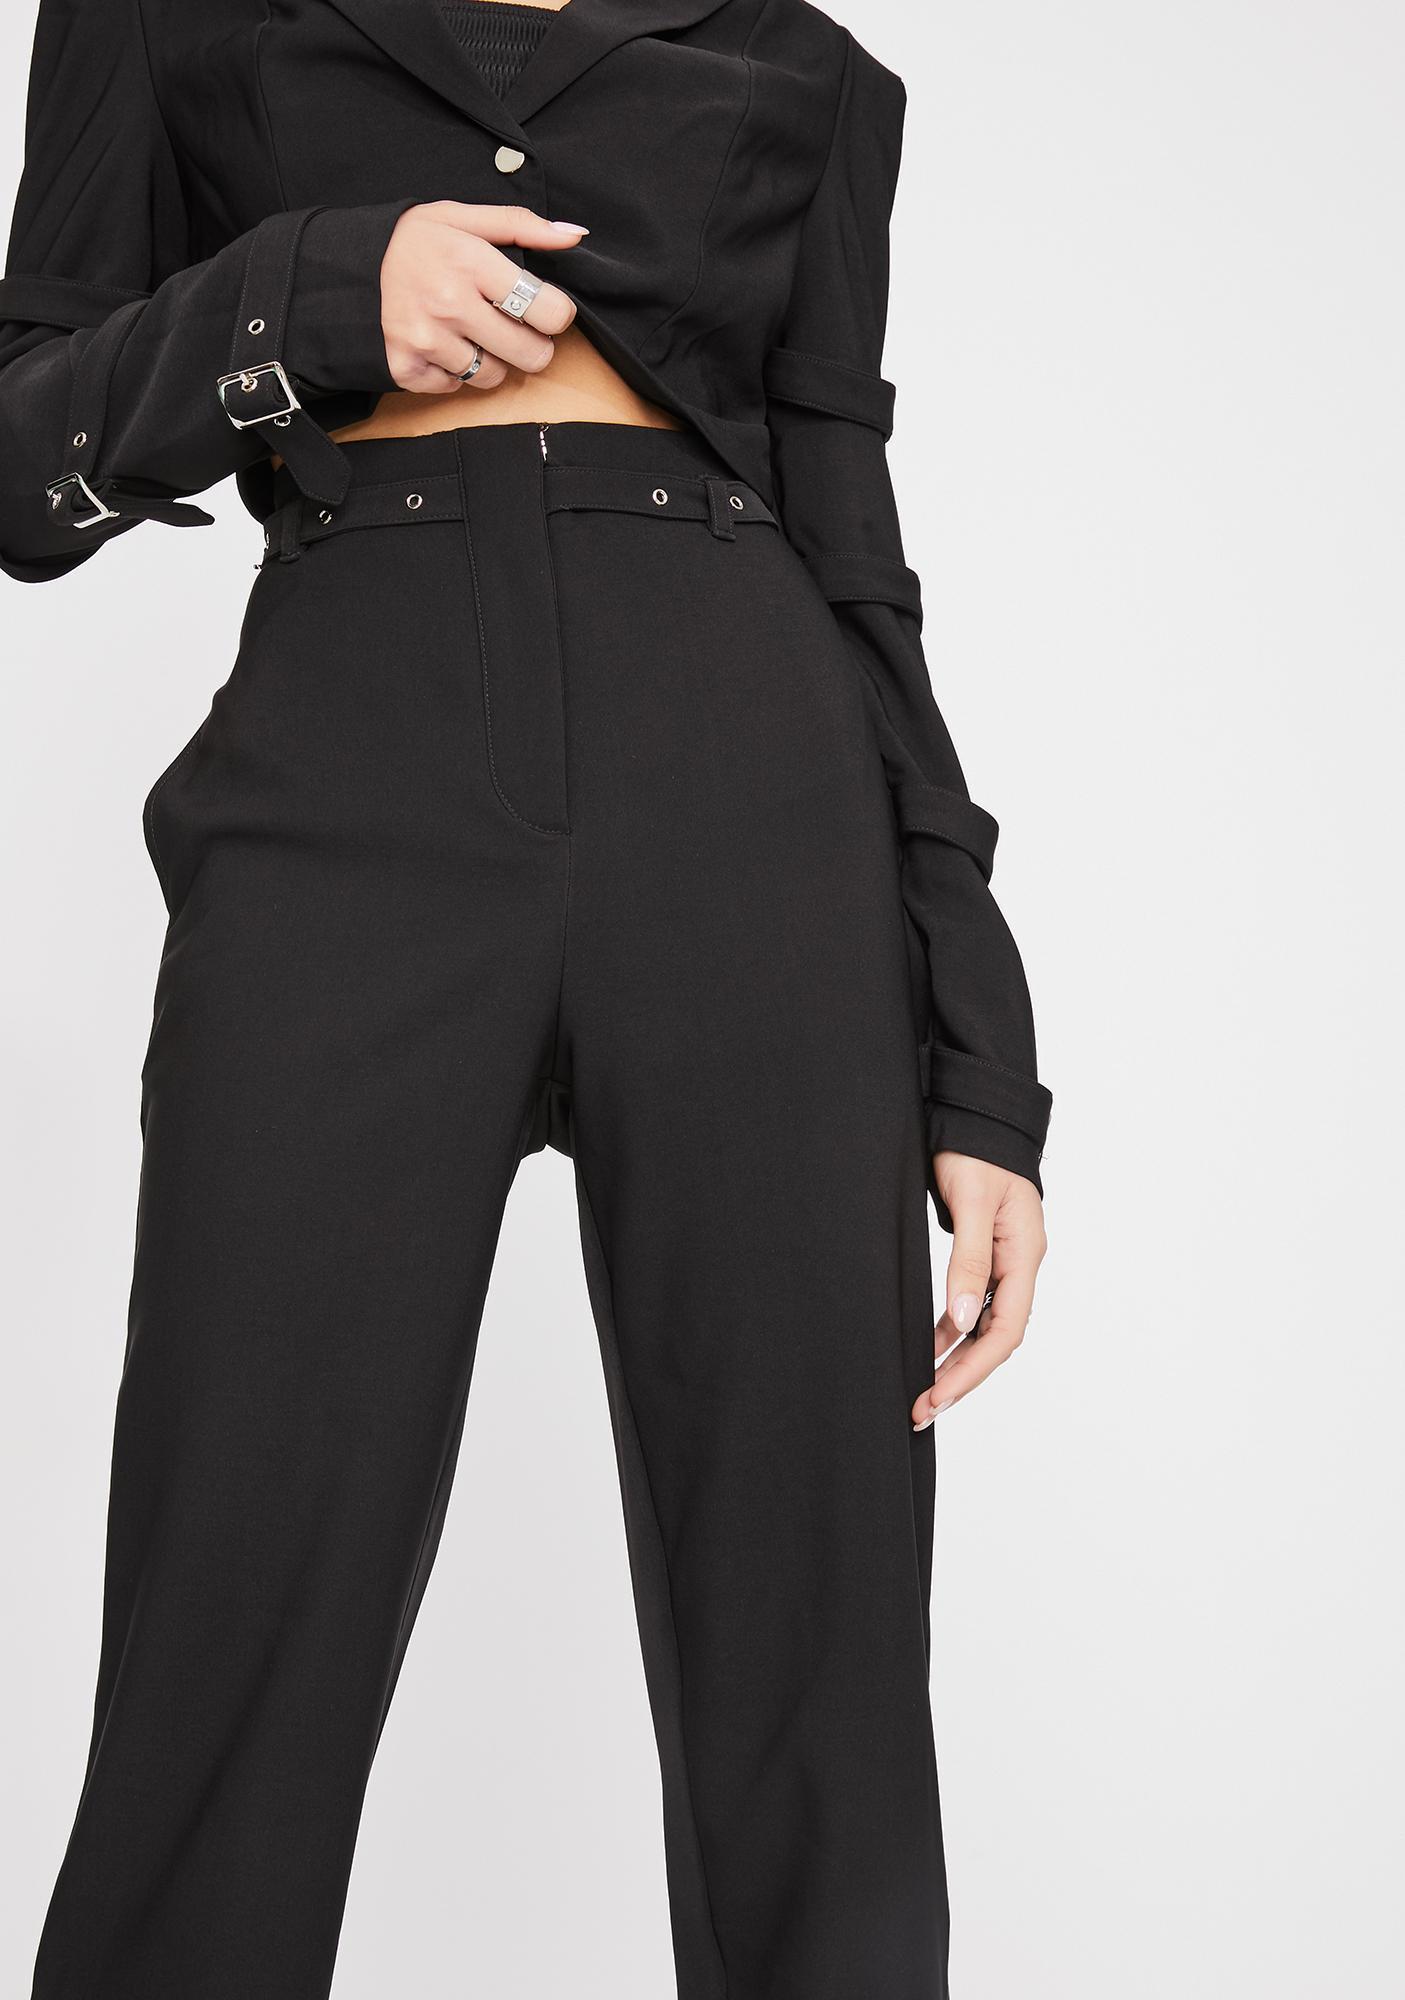 STEELE District Buckle Pants